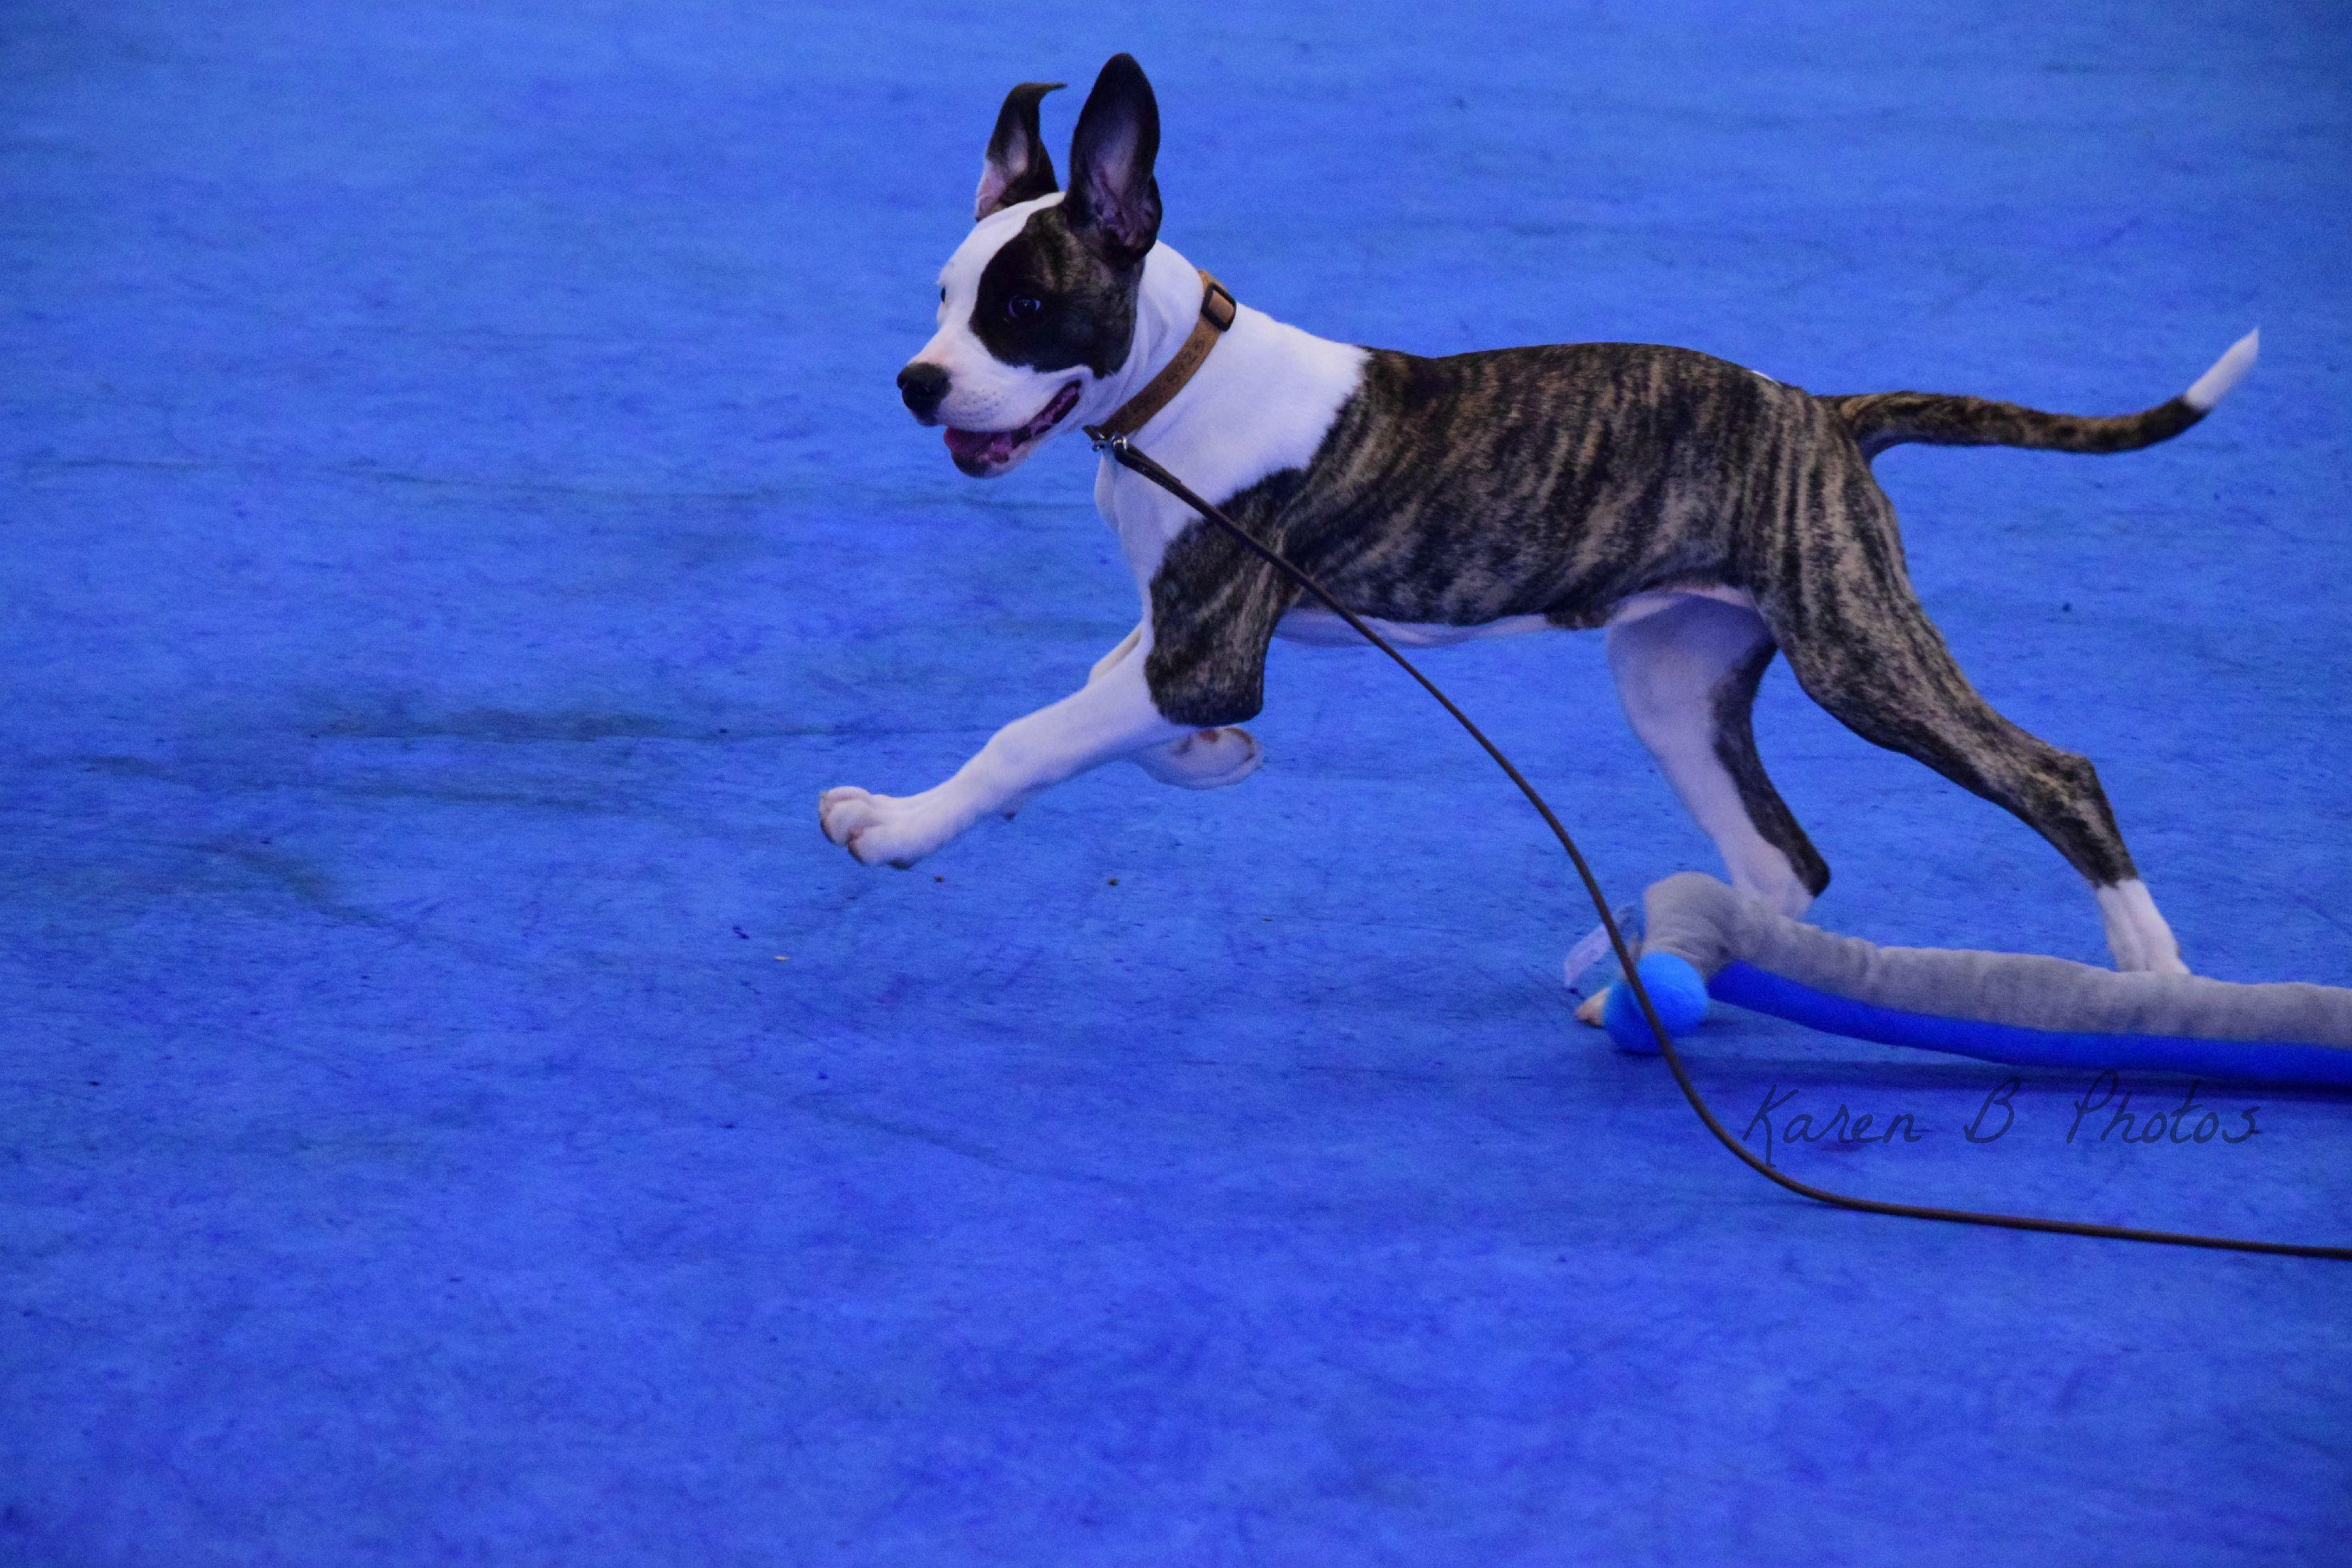 indoor dog play, dog training gym, dog playing